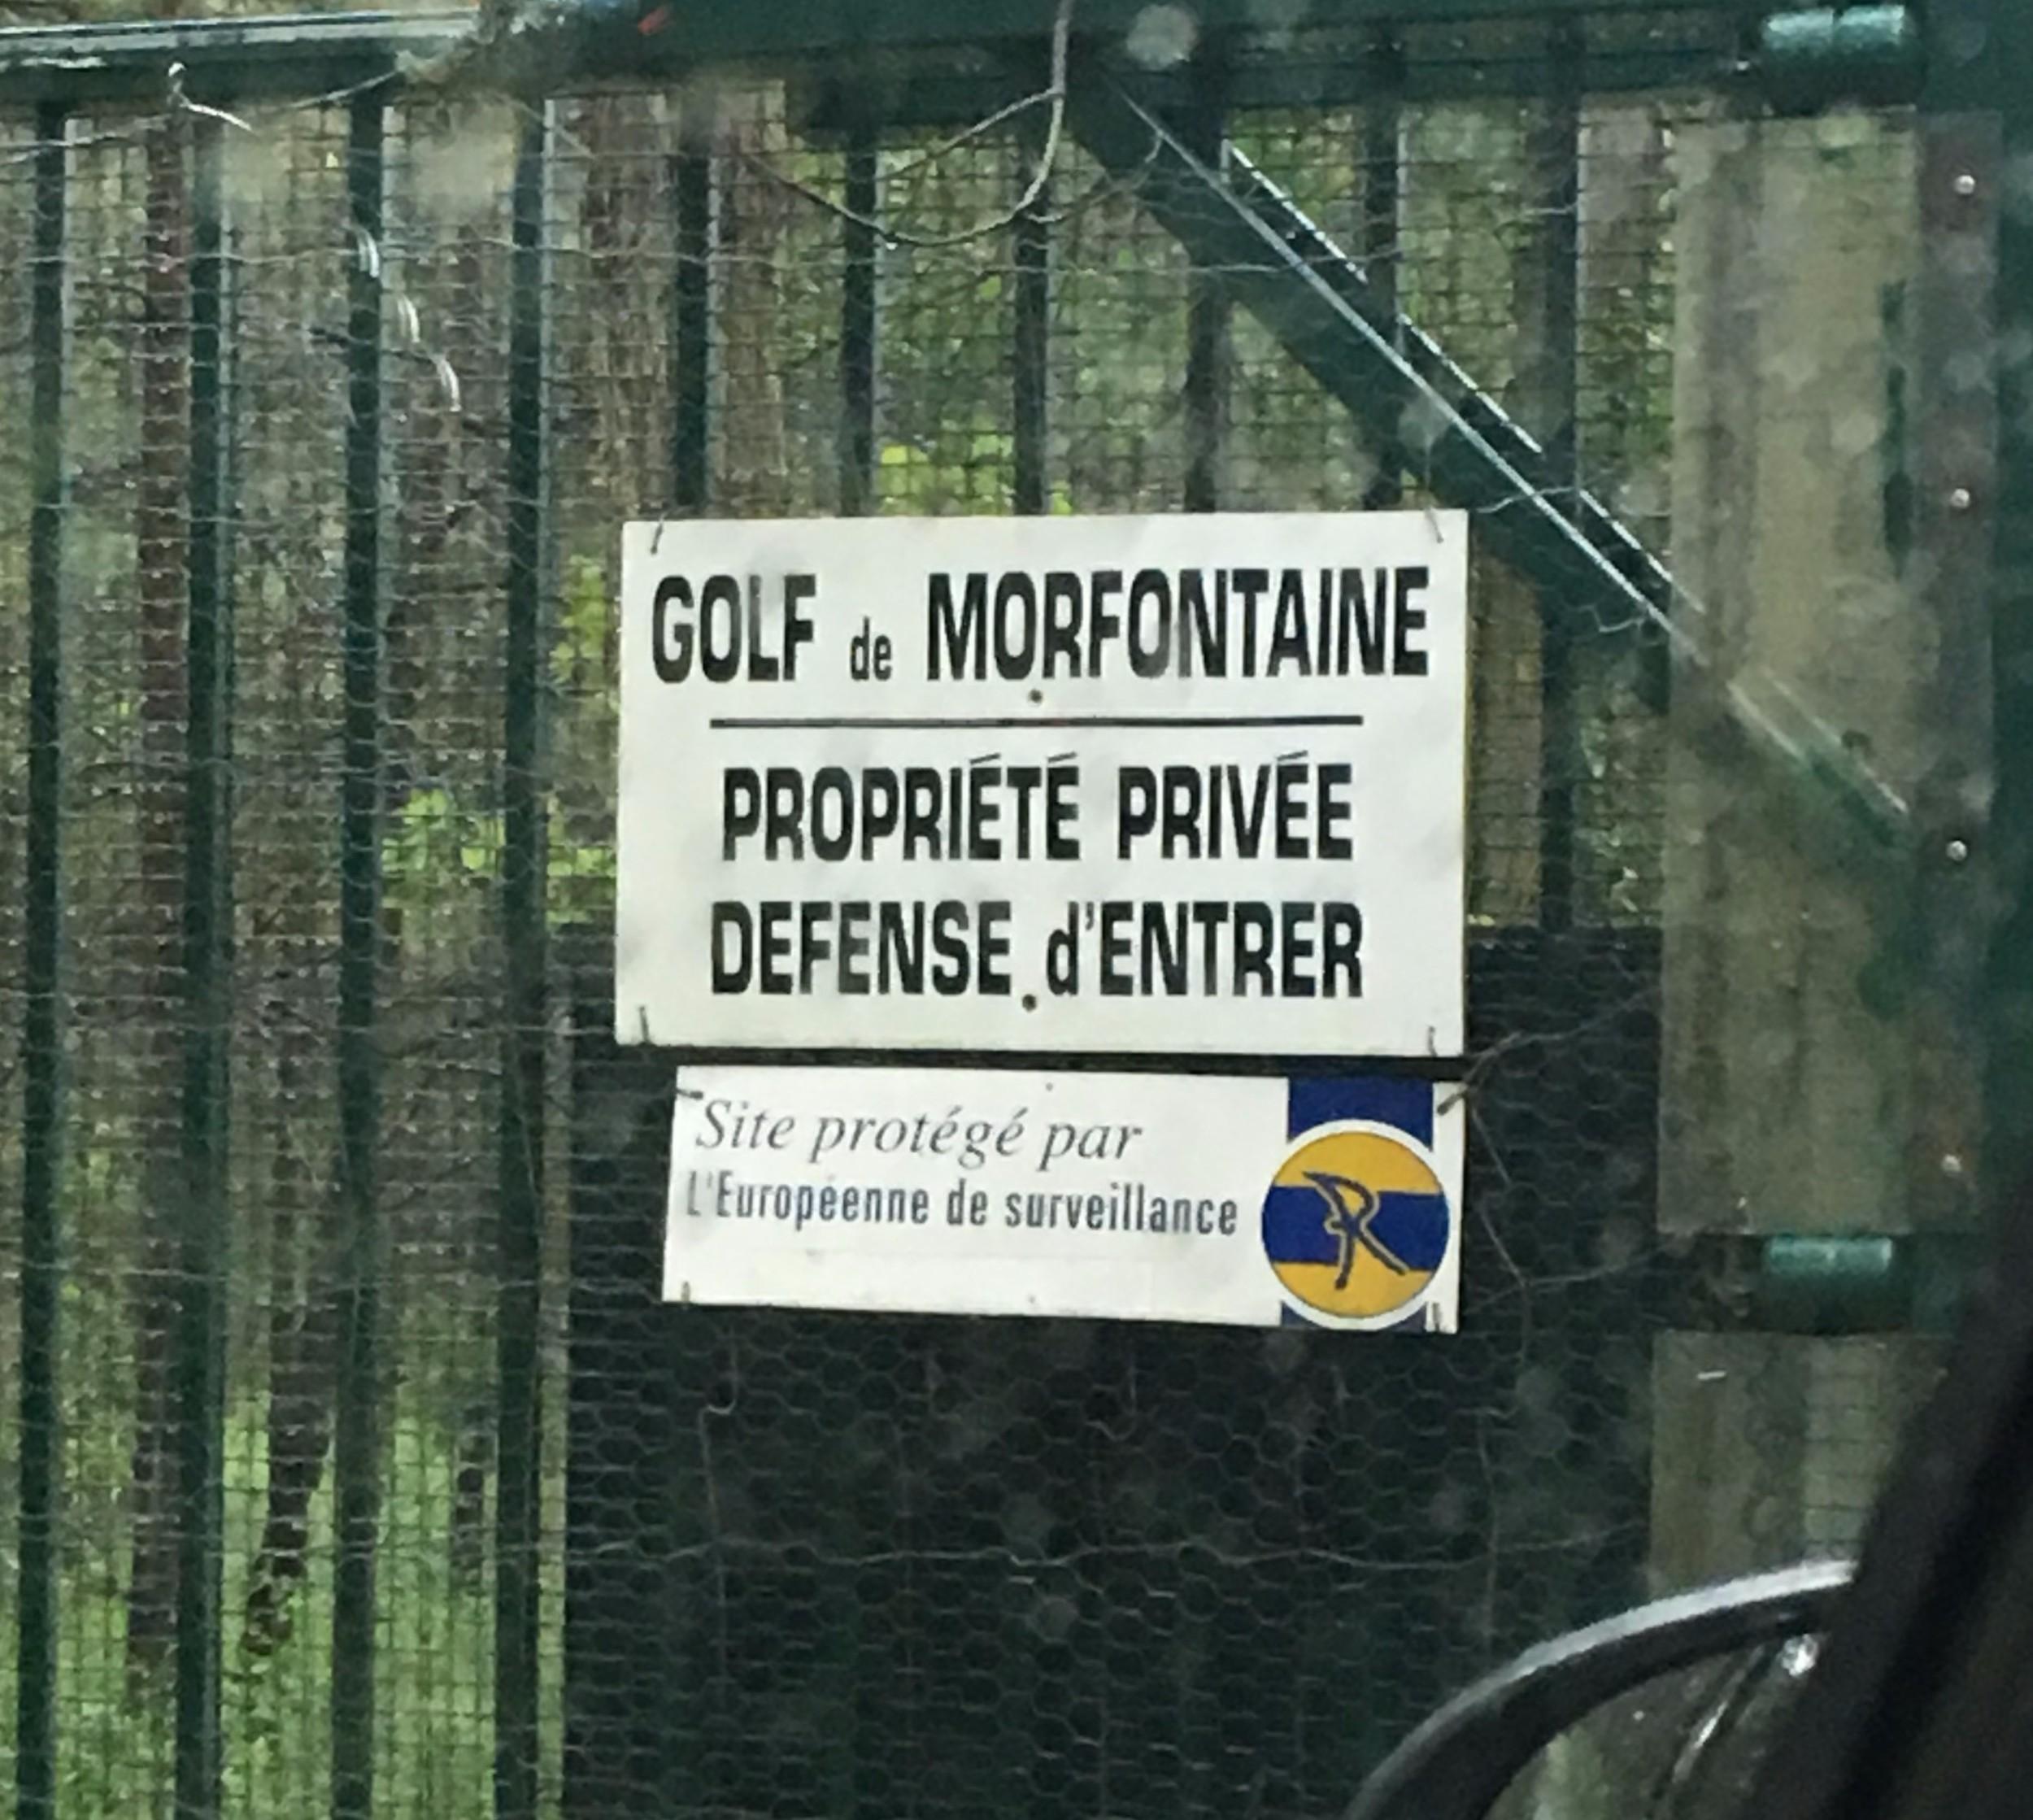 Morfontaine (7).jpg